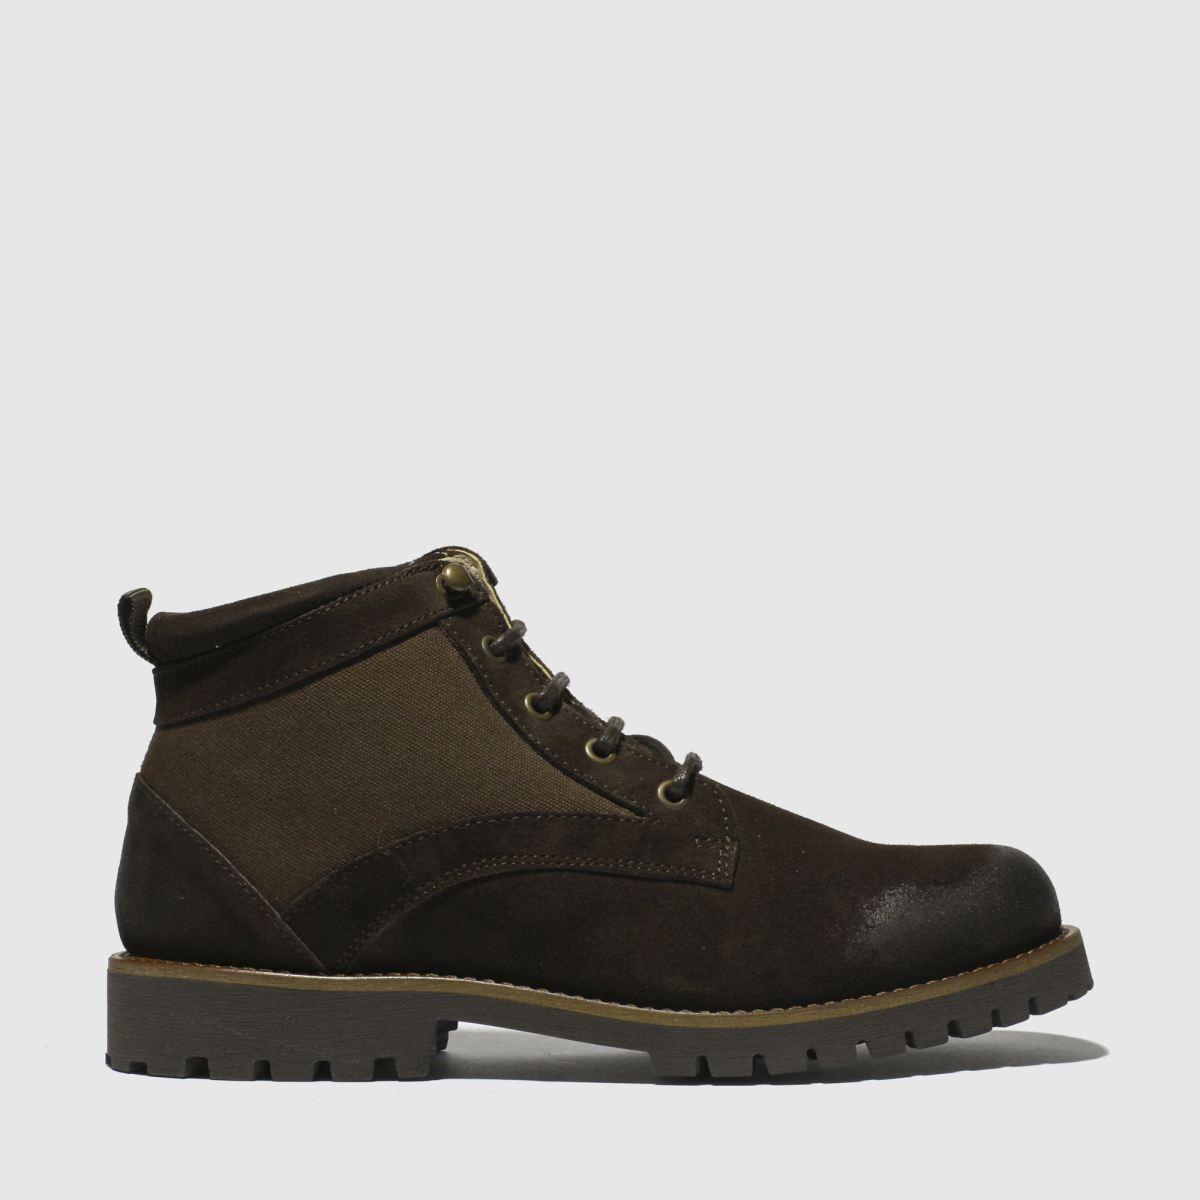 Schuh Dark Brown Commander Mix Boots